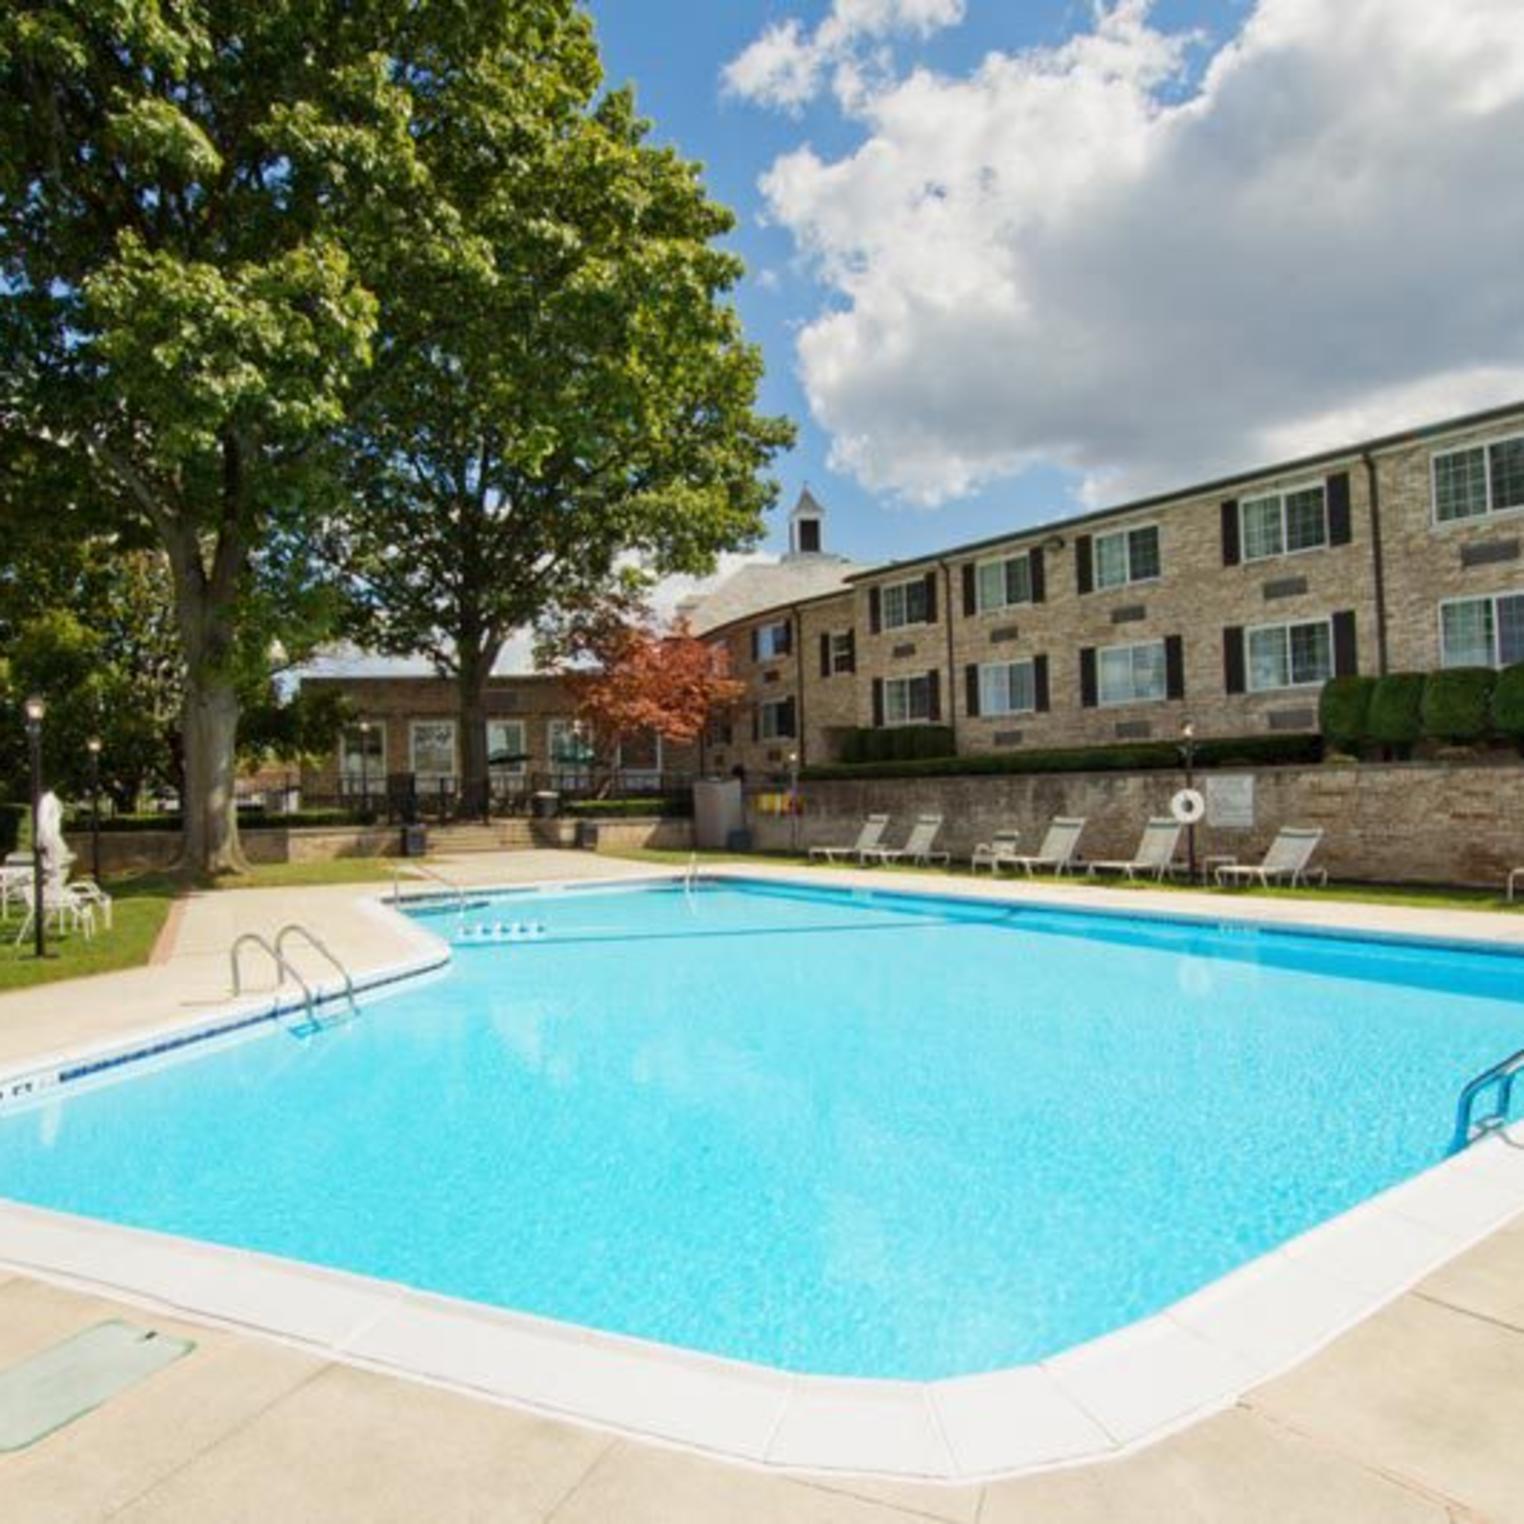 Radisson Hotel Pool